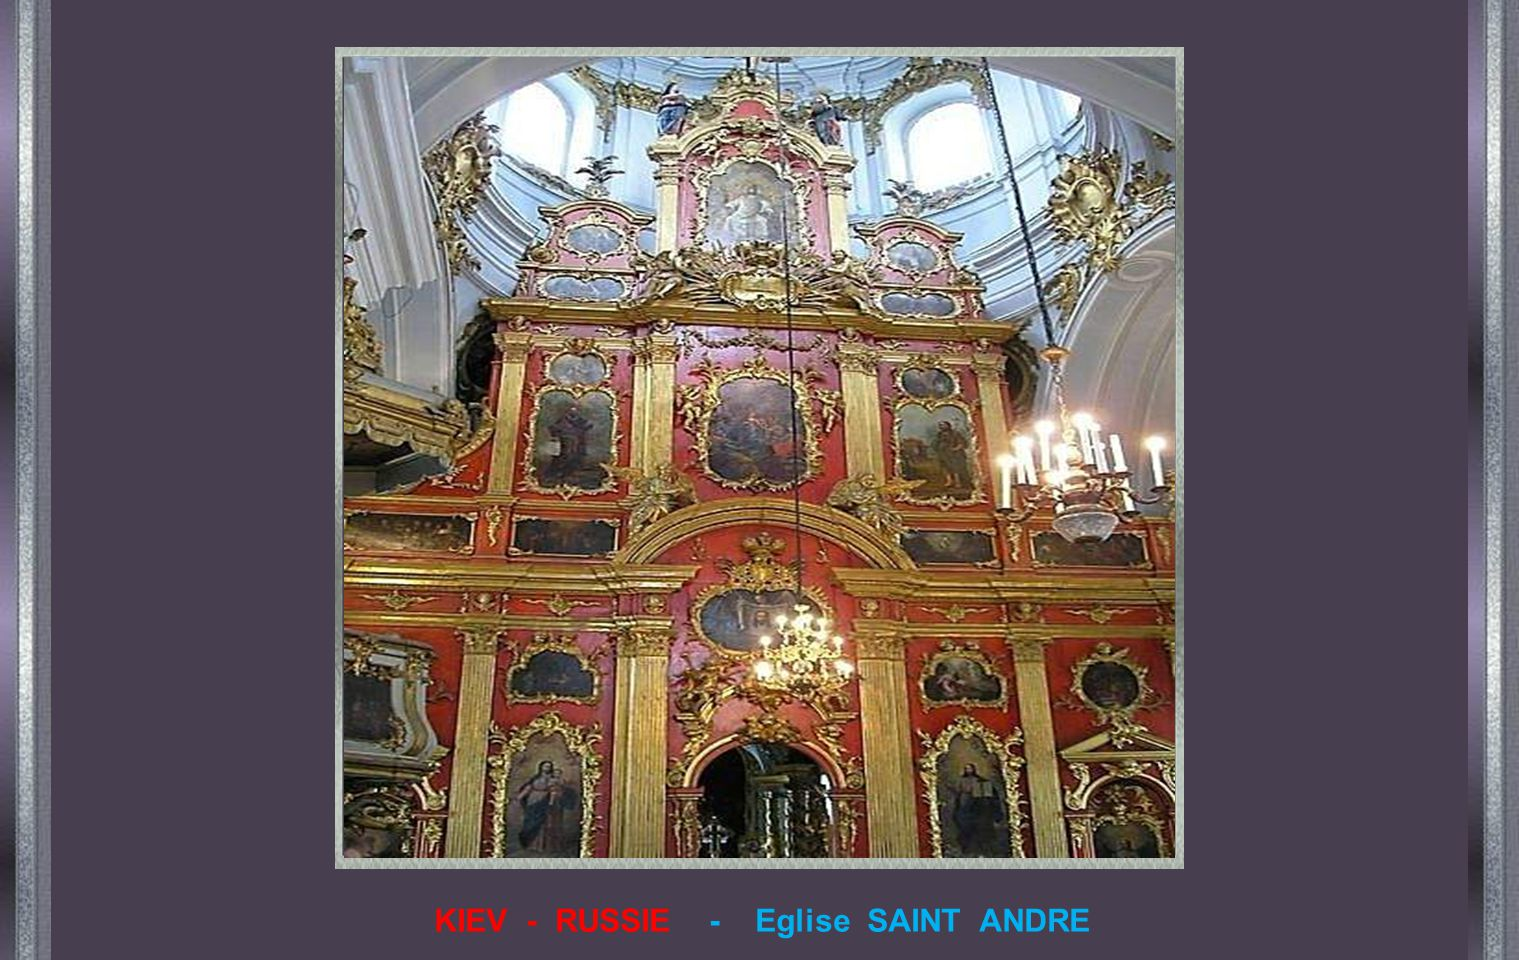 KIEV - RUSSIE - Eglise SAINT ANDRE